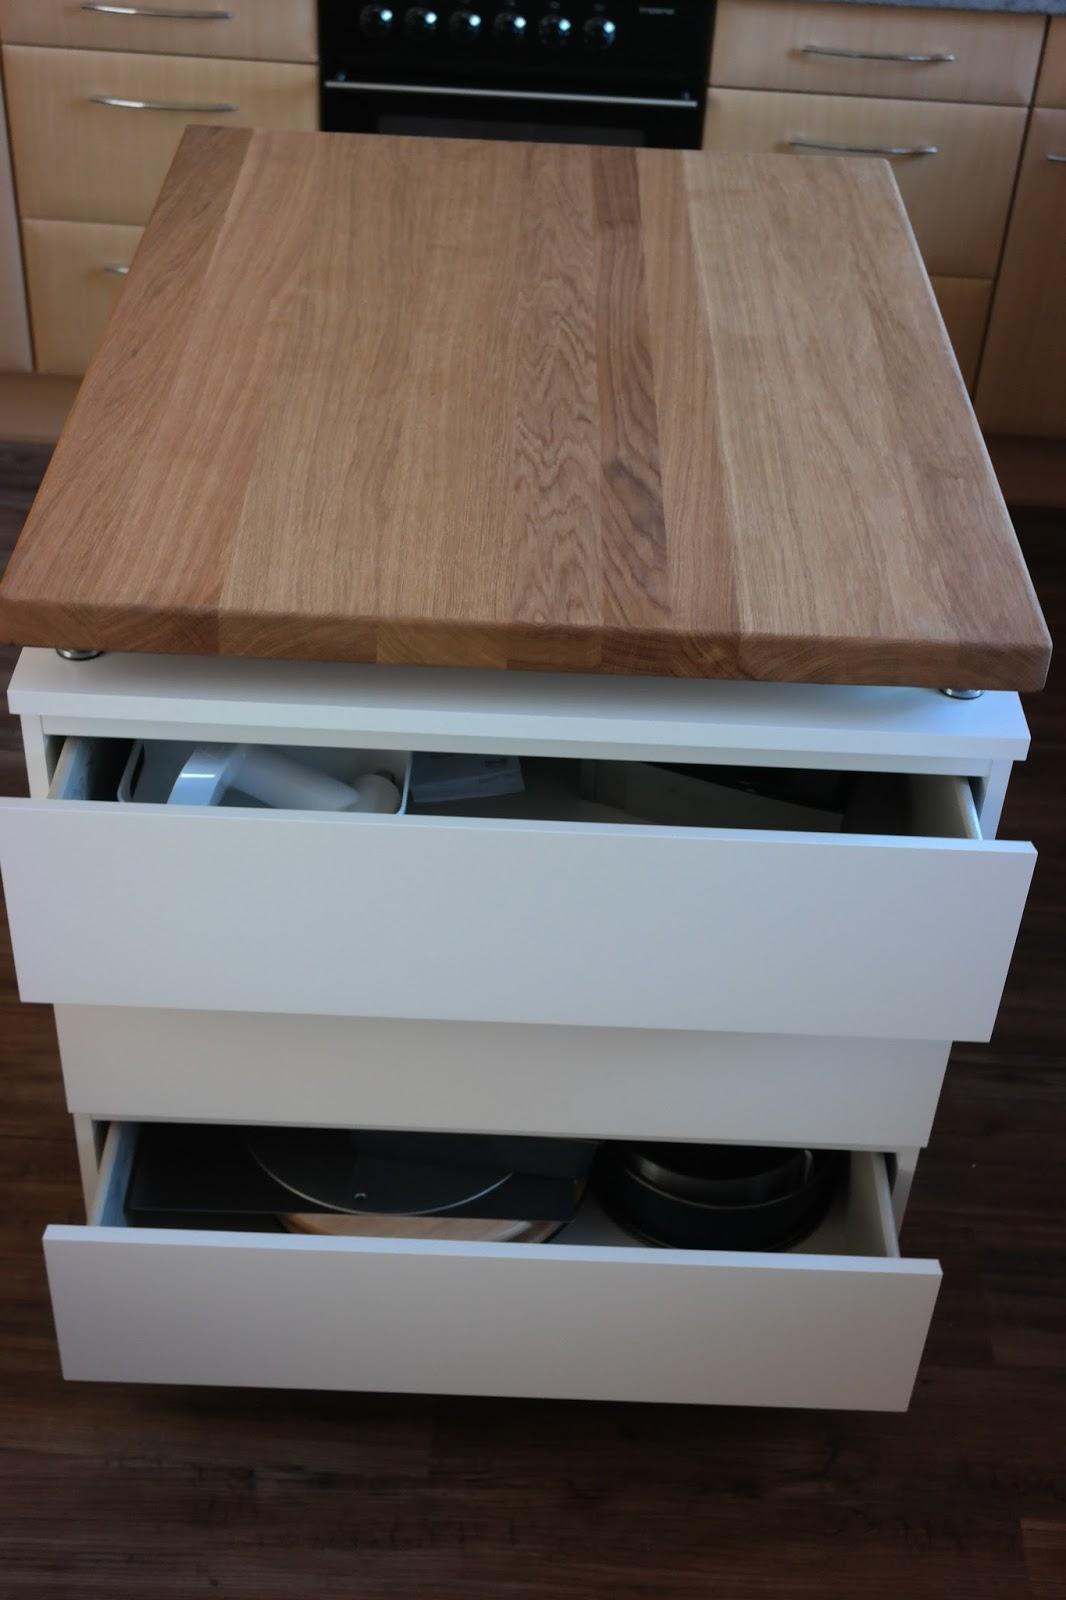 Fesselnd Ikea Kücheninsel Diy Miss Zuckerfee